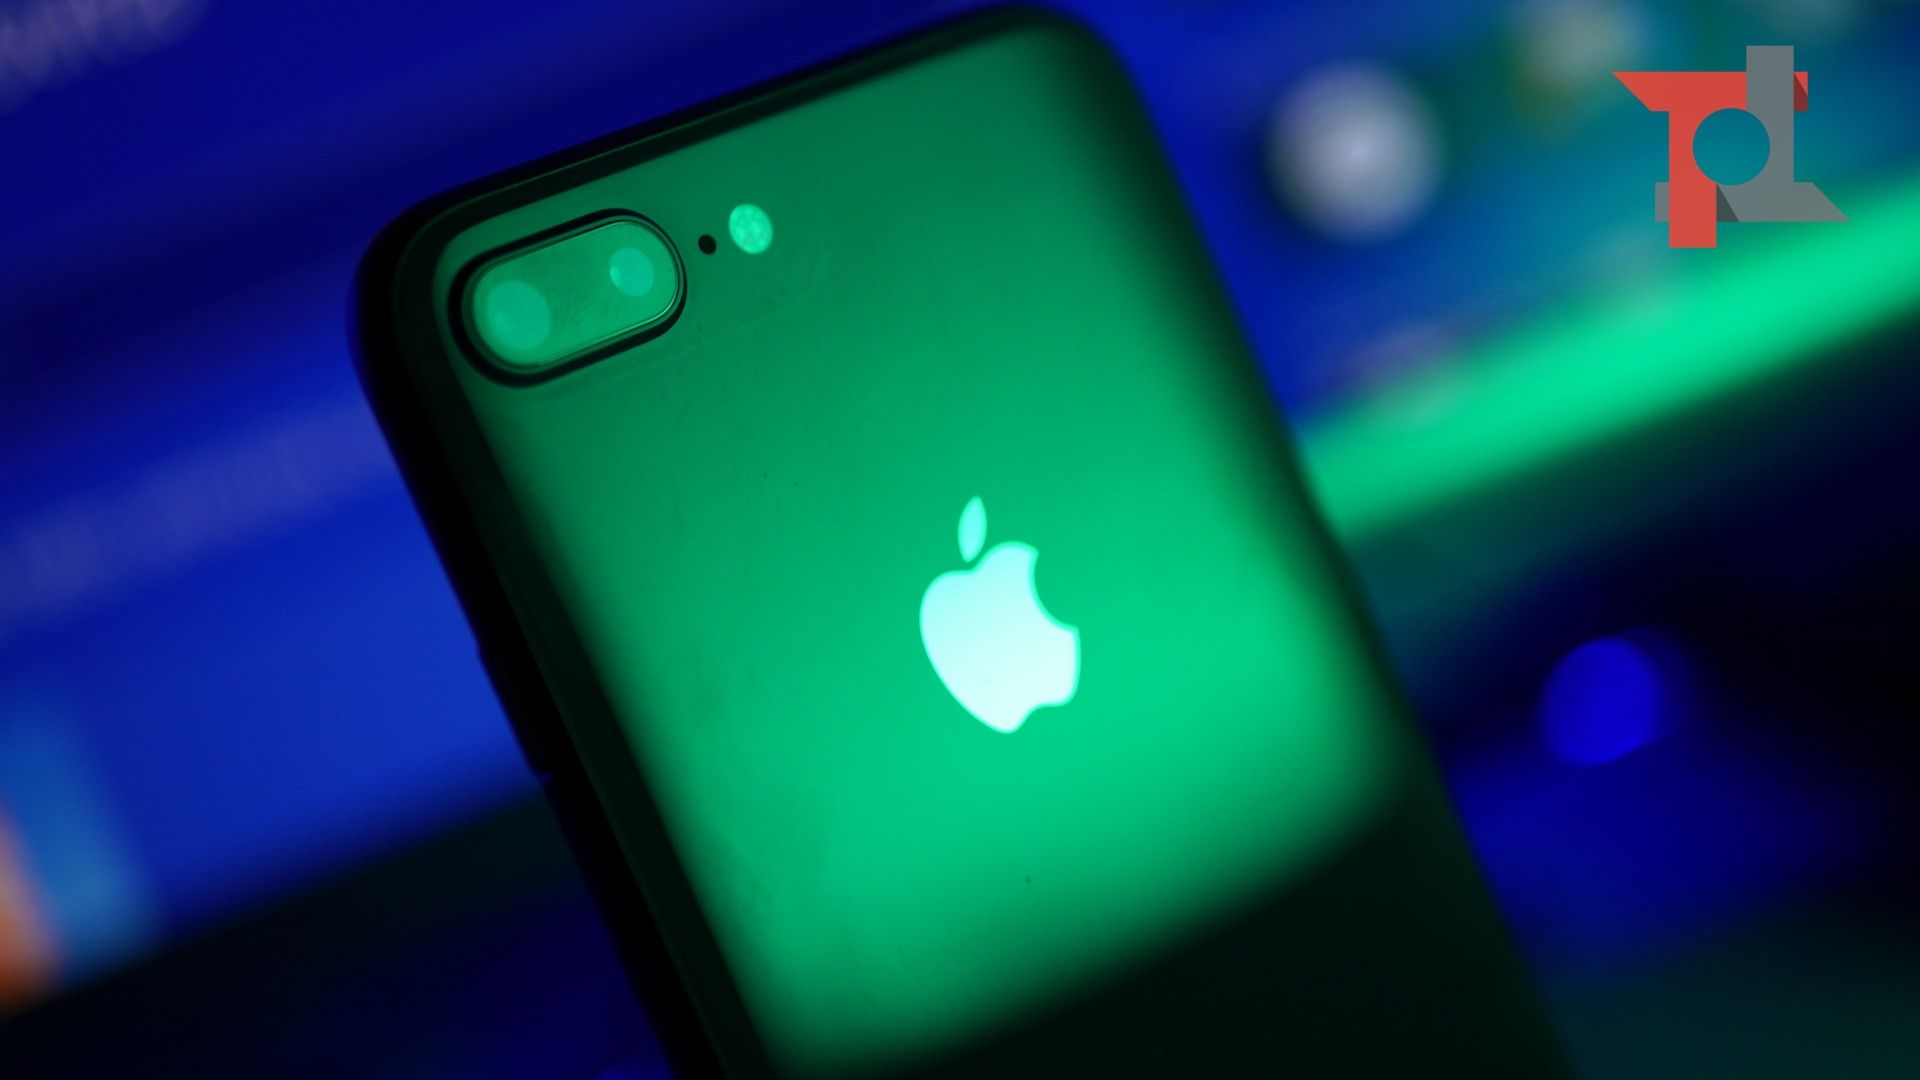 Qualcomm ottiene lo stop alle vendite di iPhone 7 e iPhone 8 in Germania 1